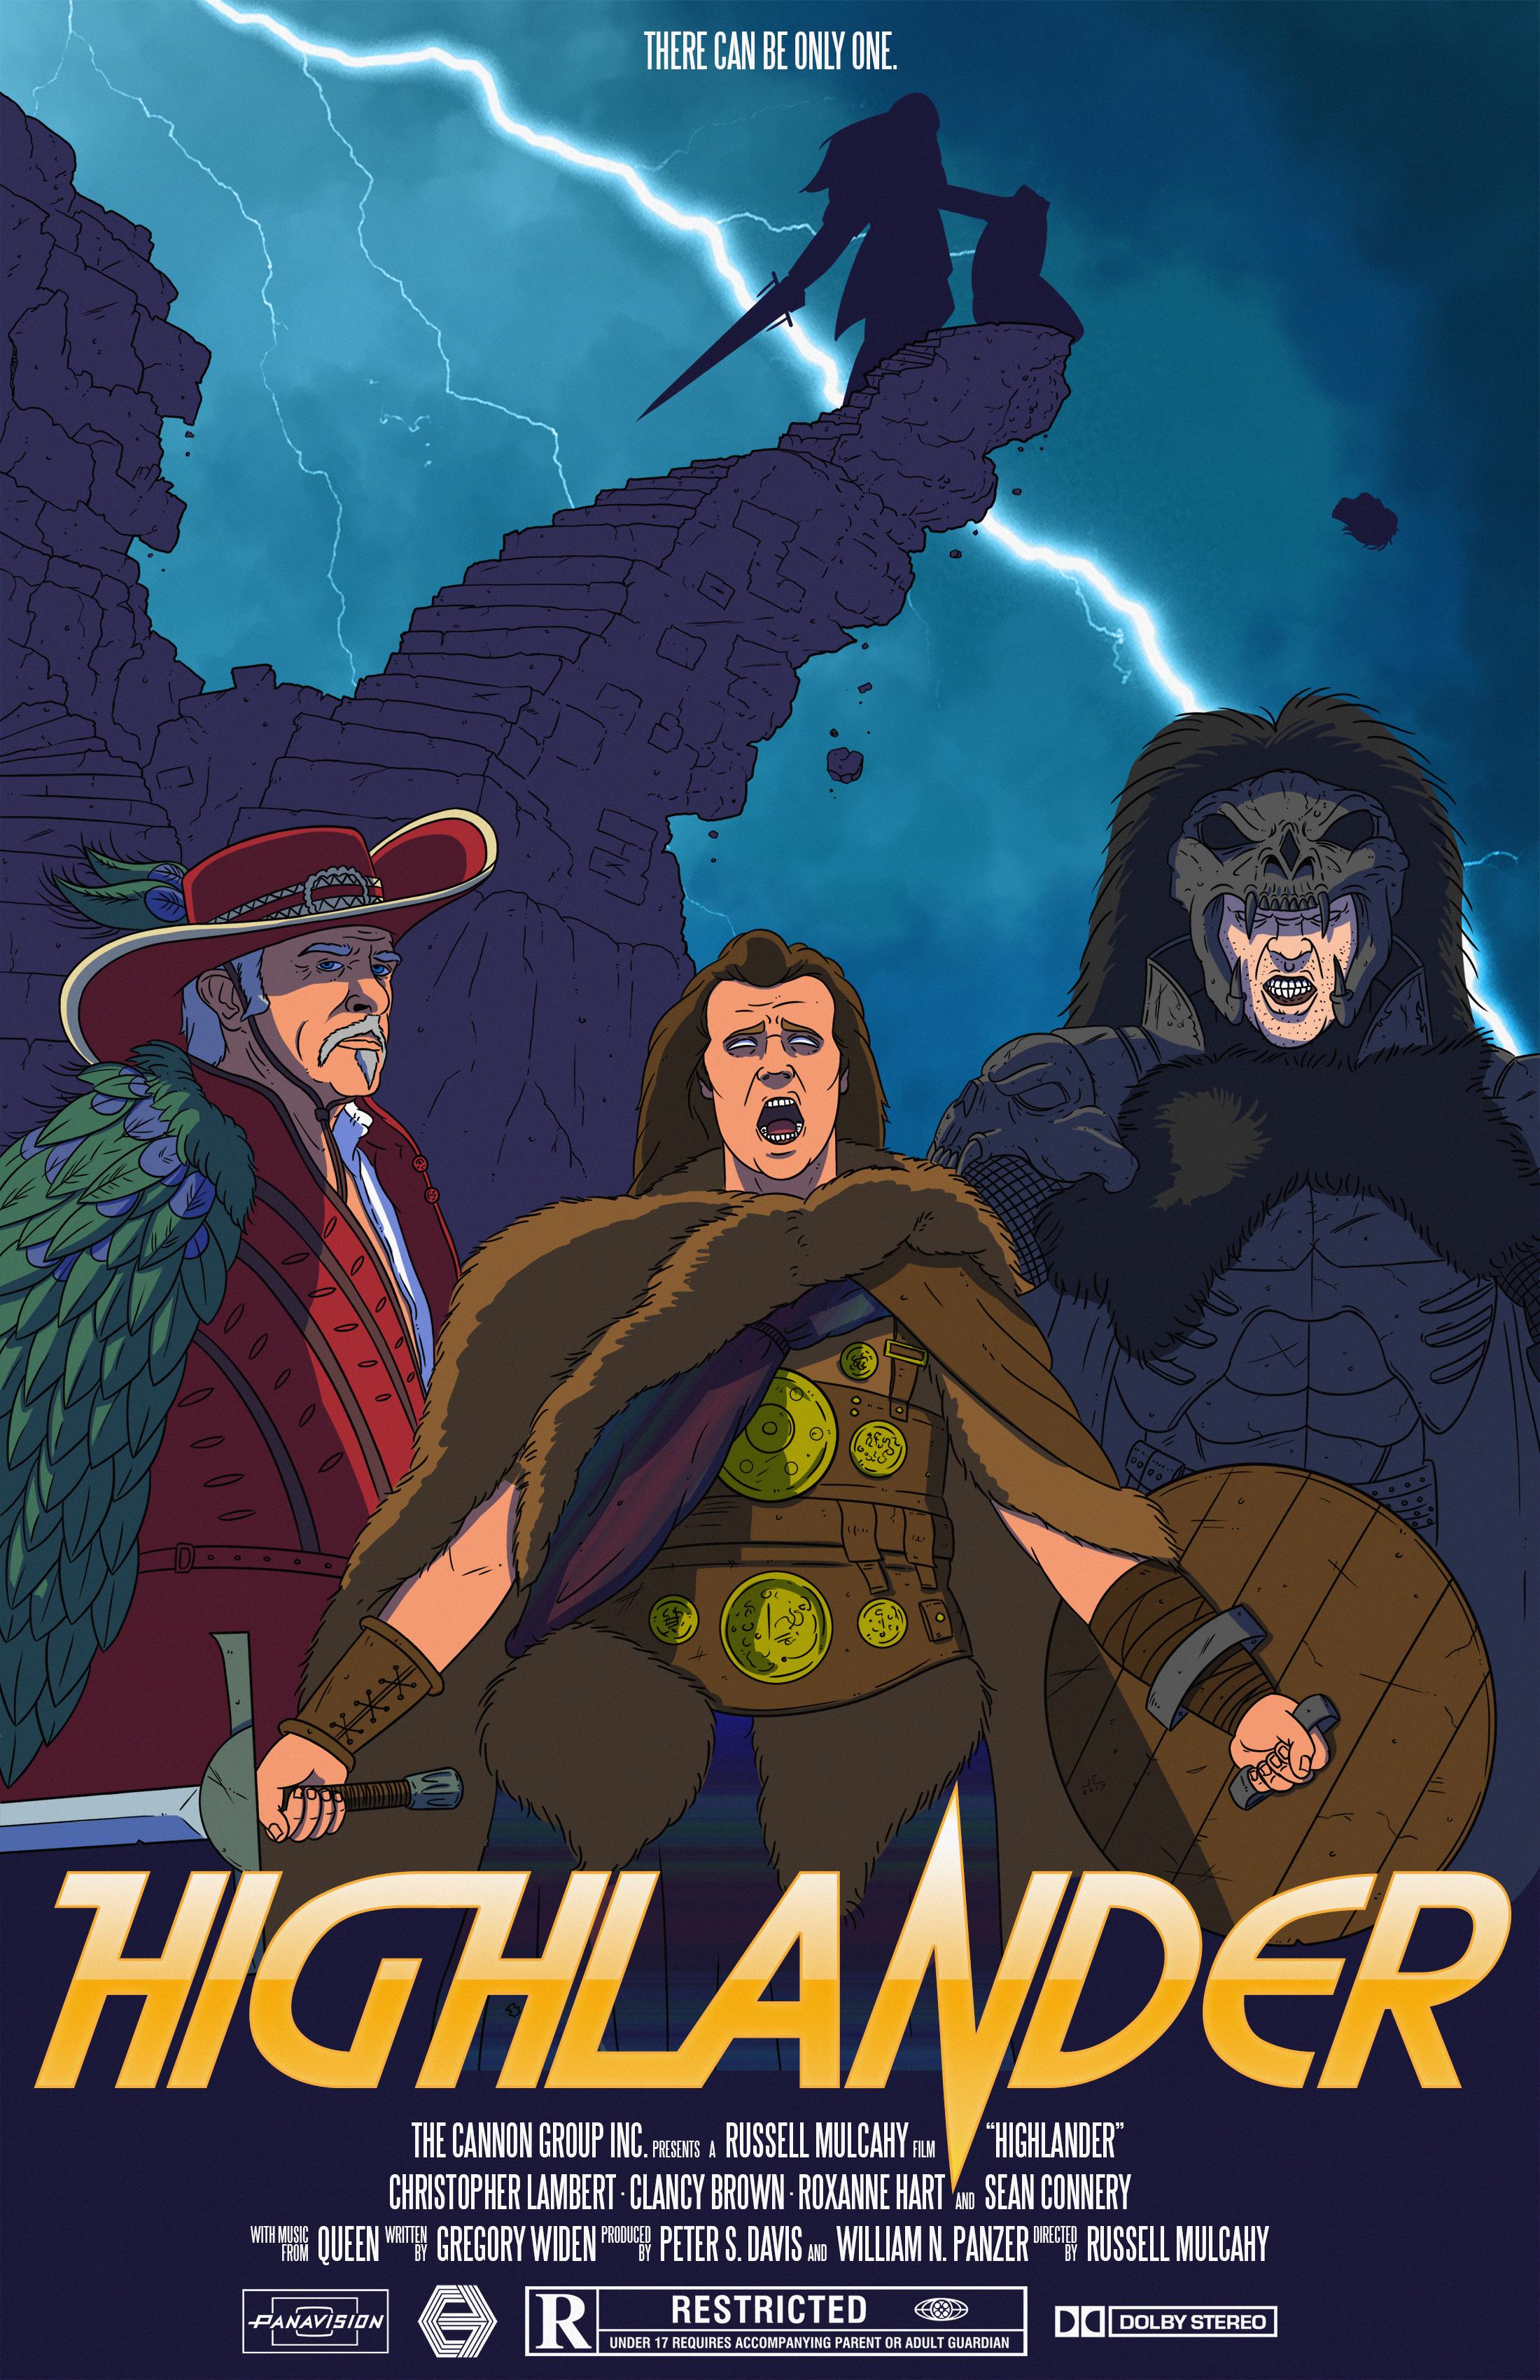 Jon-Caron-Highlander-Movie-Poster-JC-Art.jpg